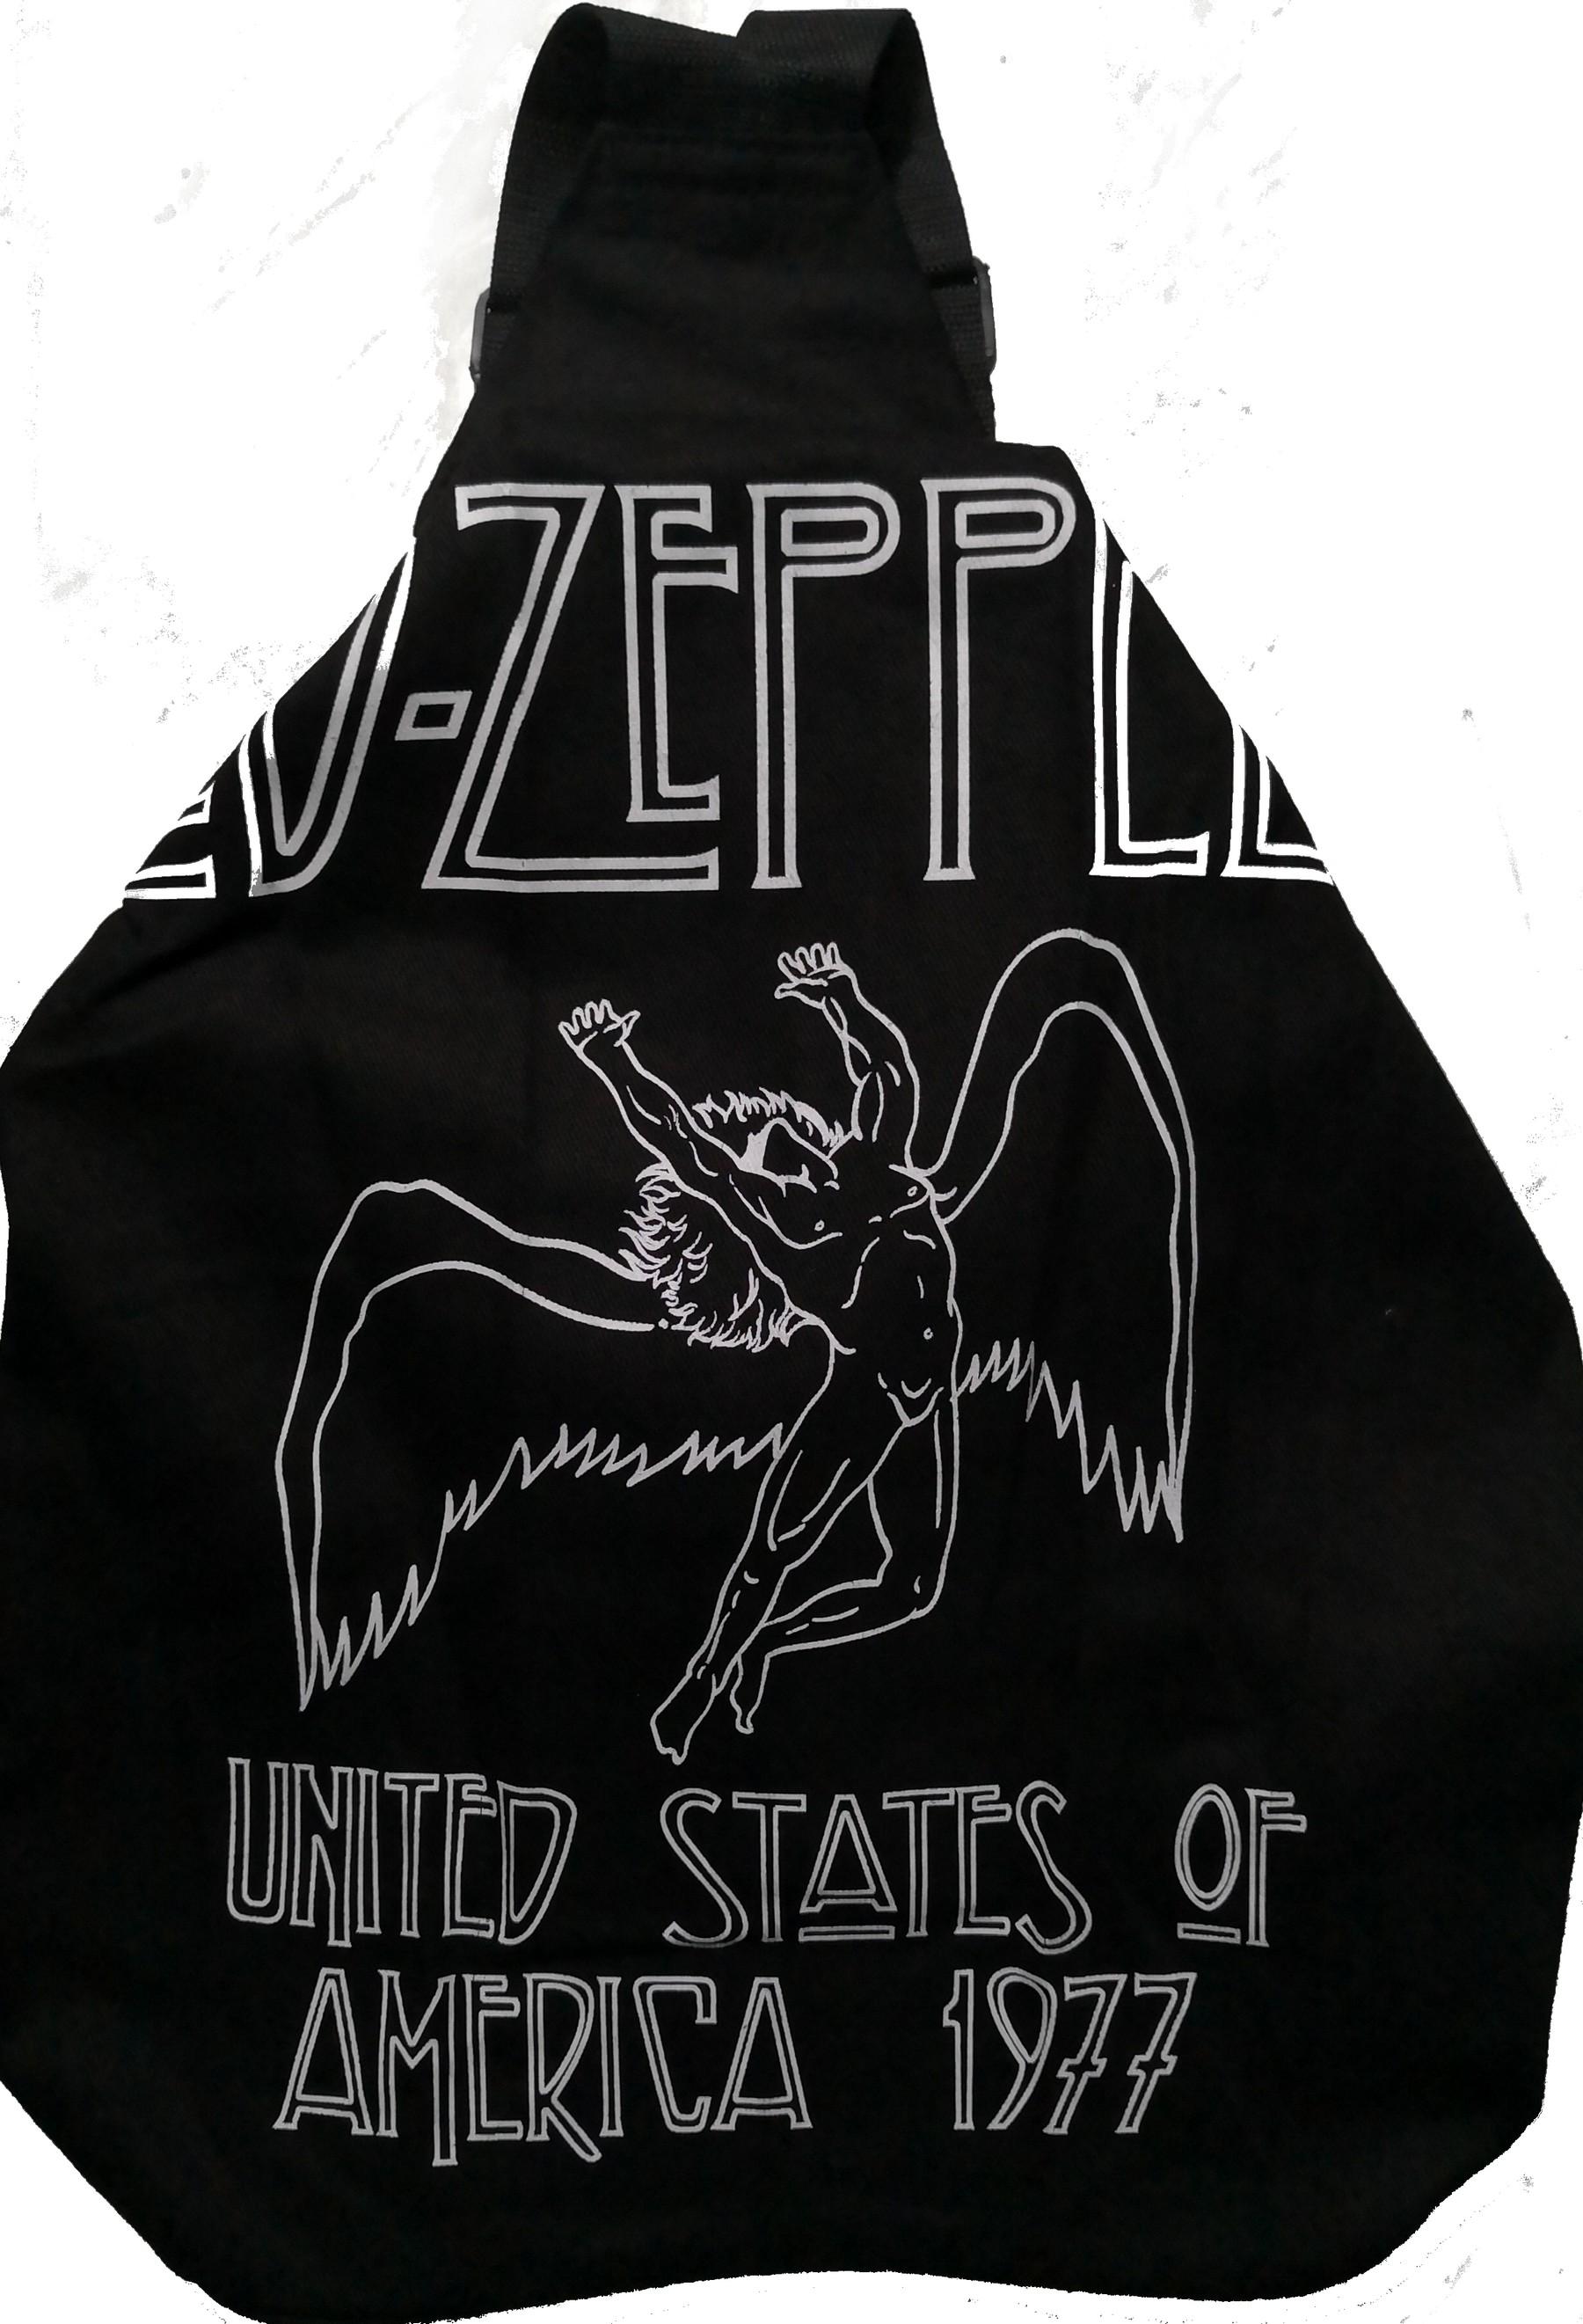 356f35693319f Led Zeppelin backpack United States of America 1977 – RoxxBKK